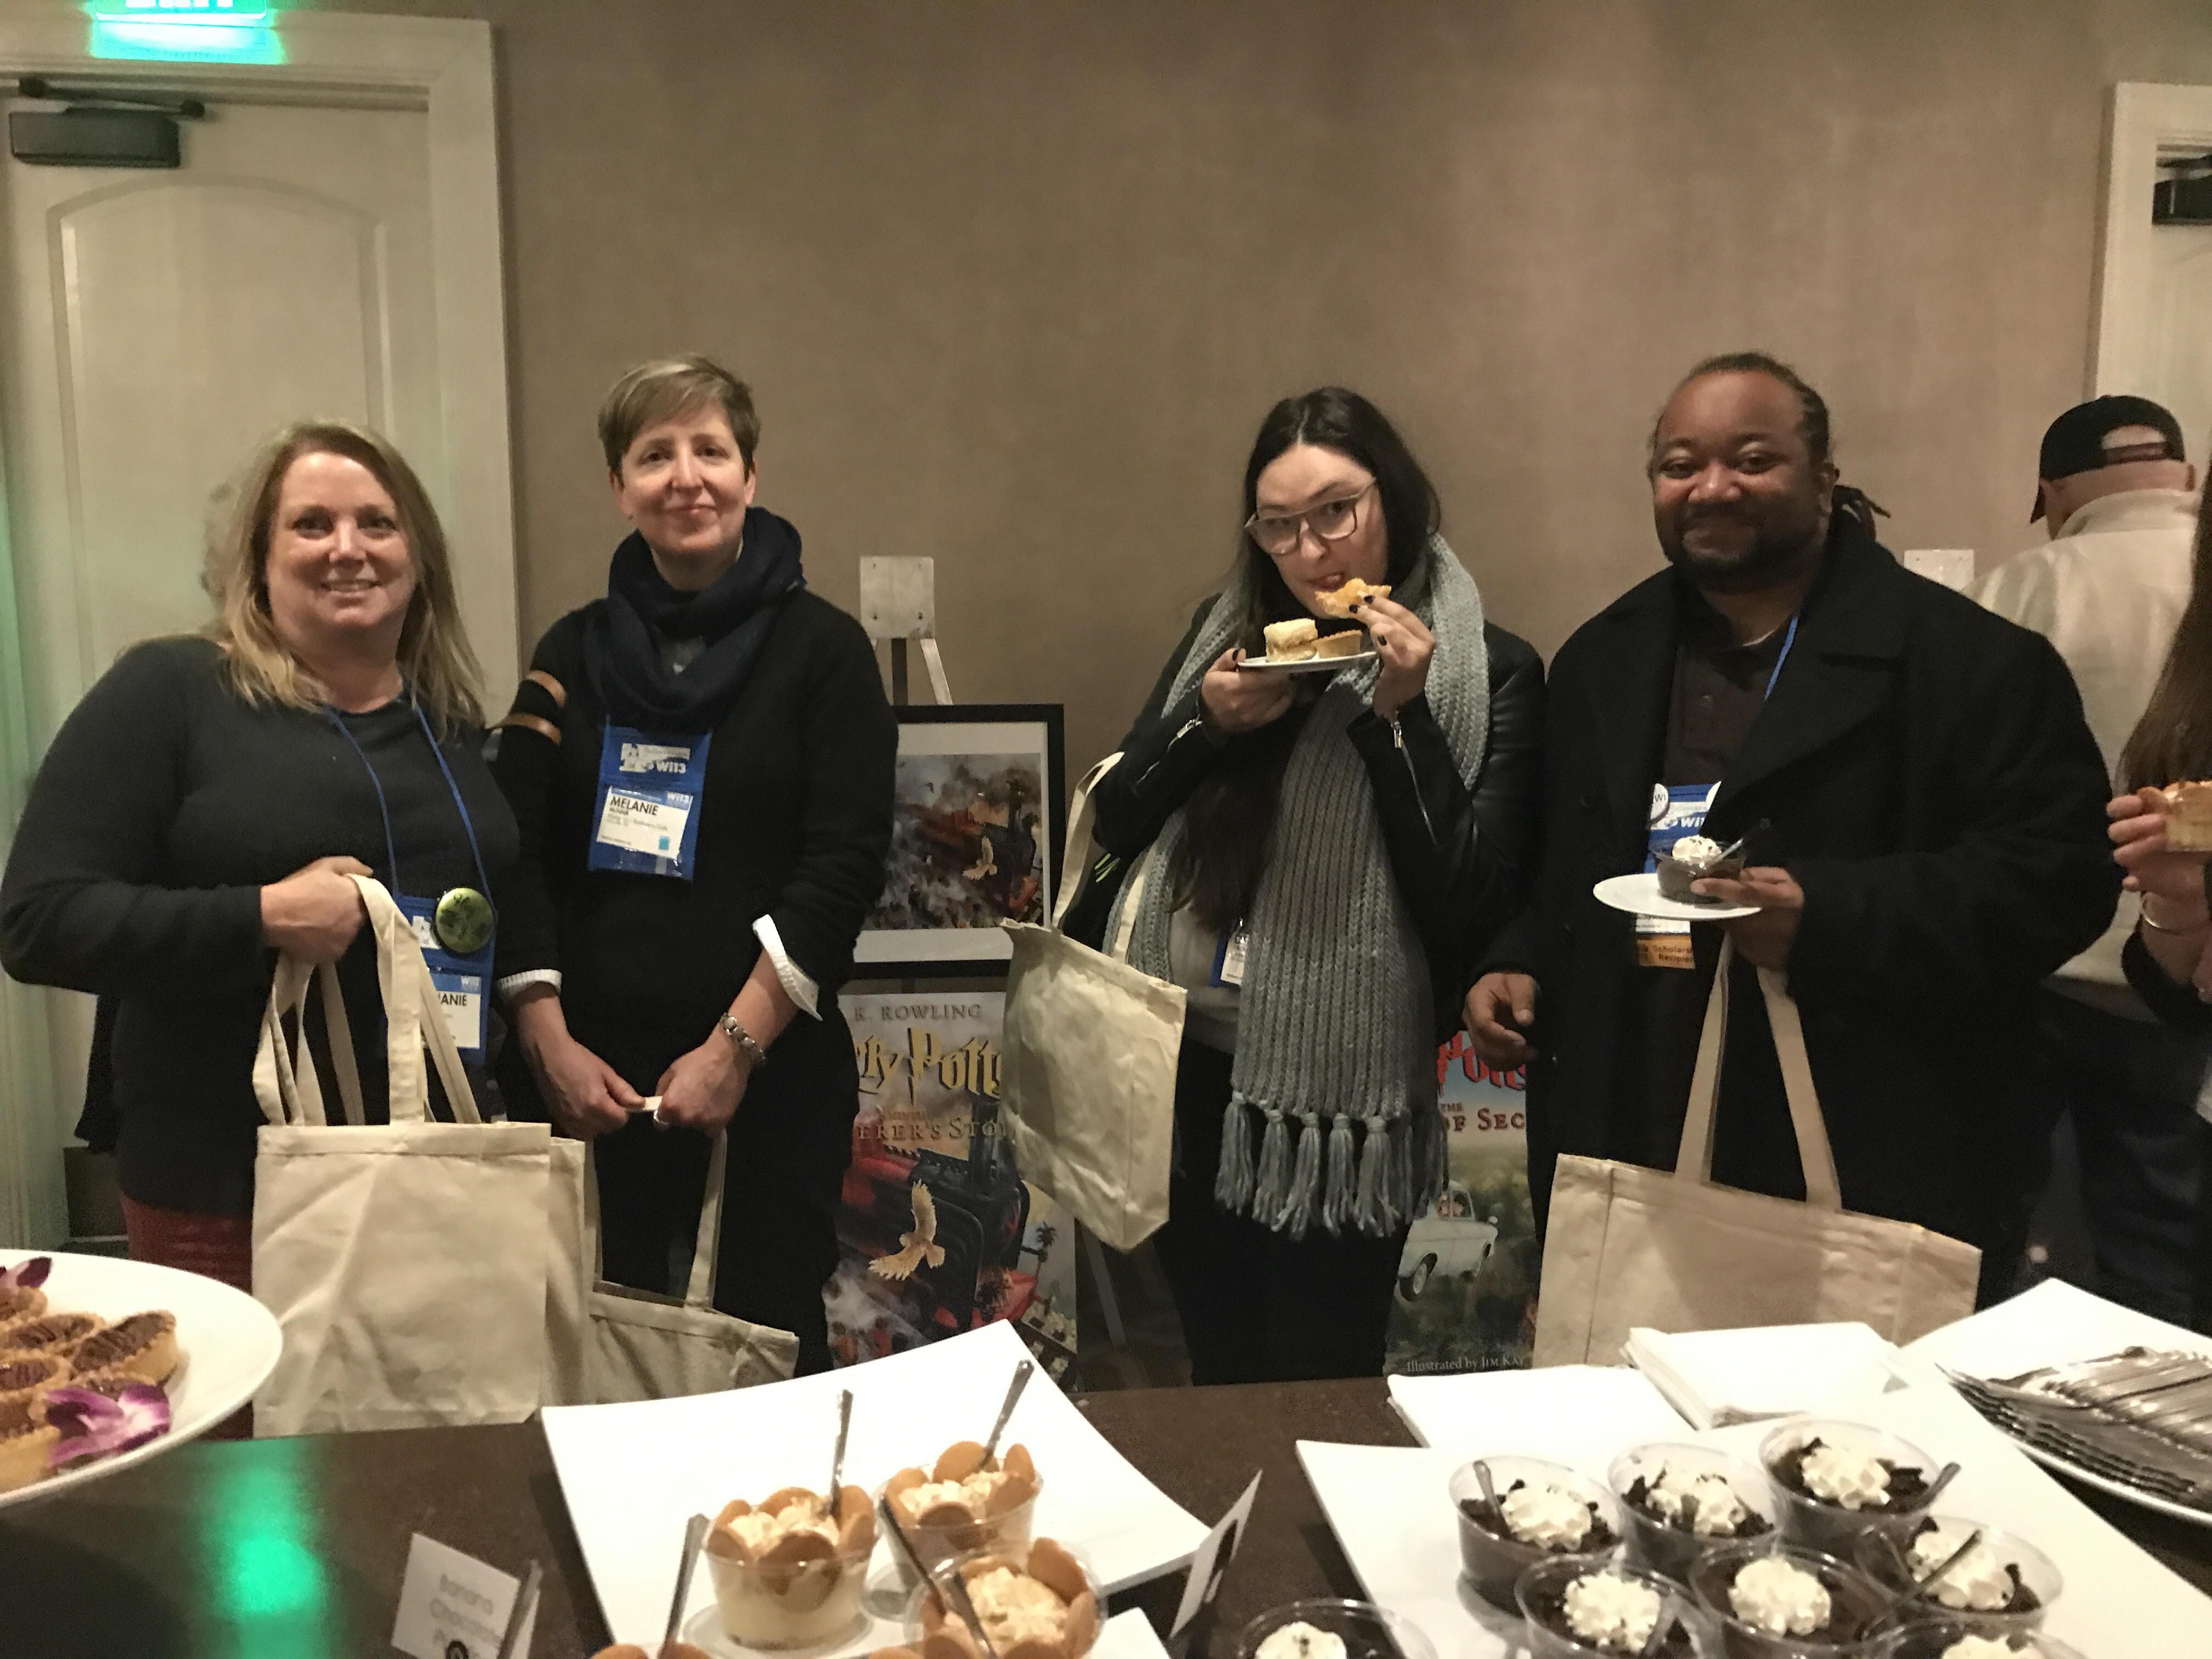 Stephanie Gordon, Melanie McNair, Destenie Fafard, and Robert Turner at the Scholastic Meet & Treat After Party.